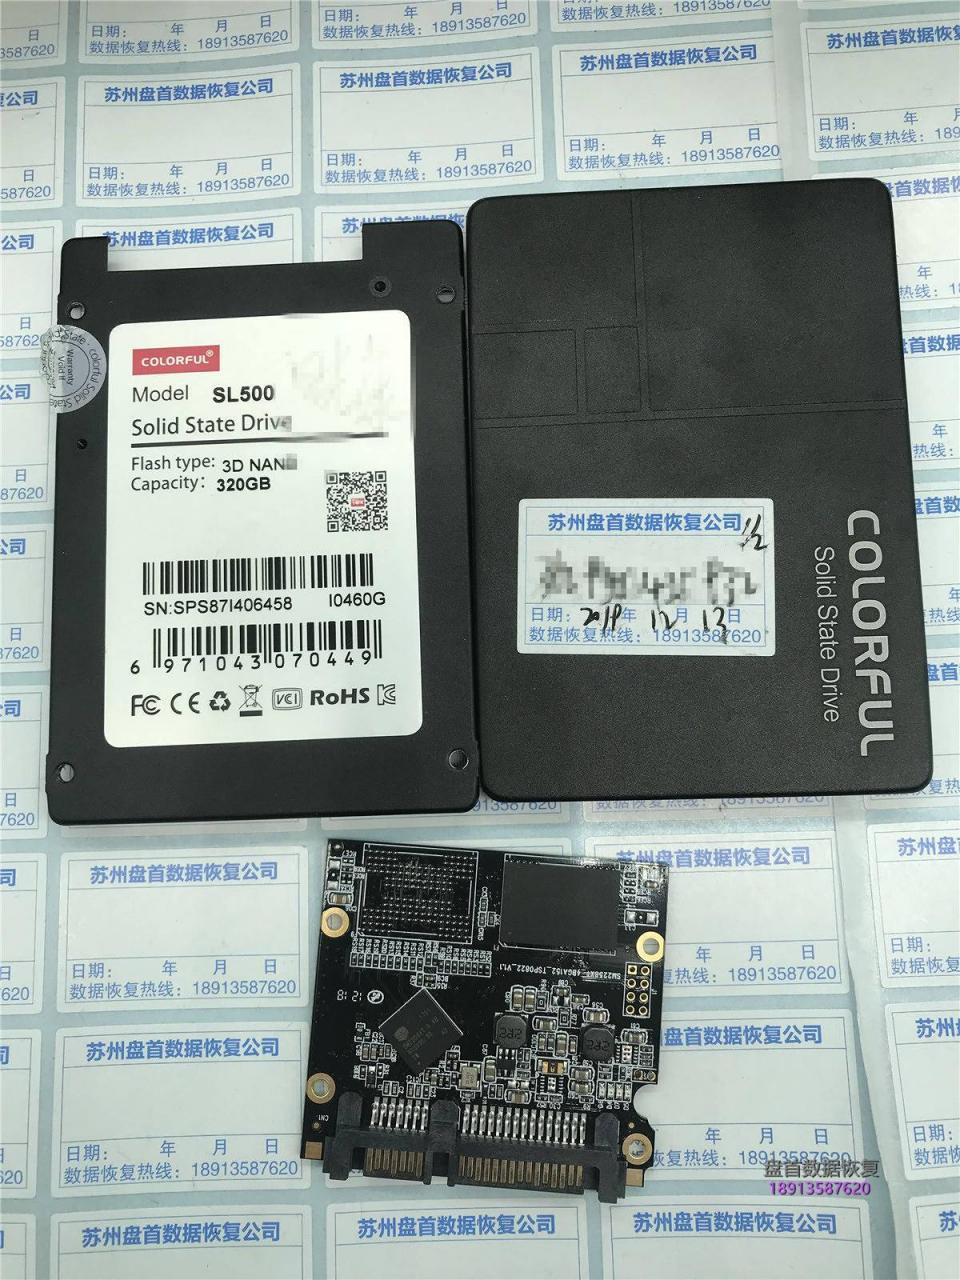 SM2258XT七彩虹320G SL500 SSD数据恢复成功